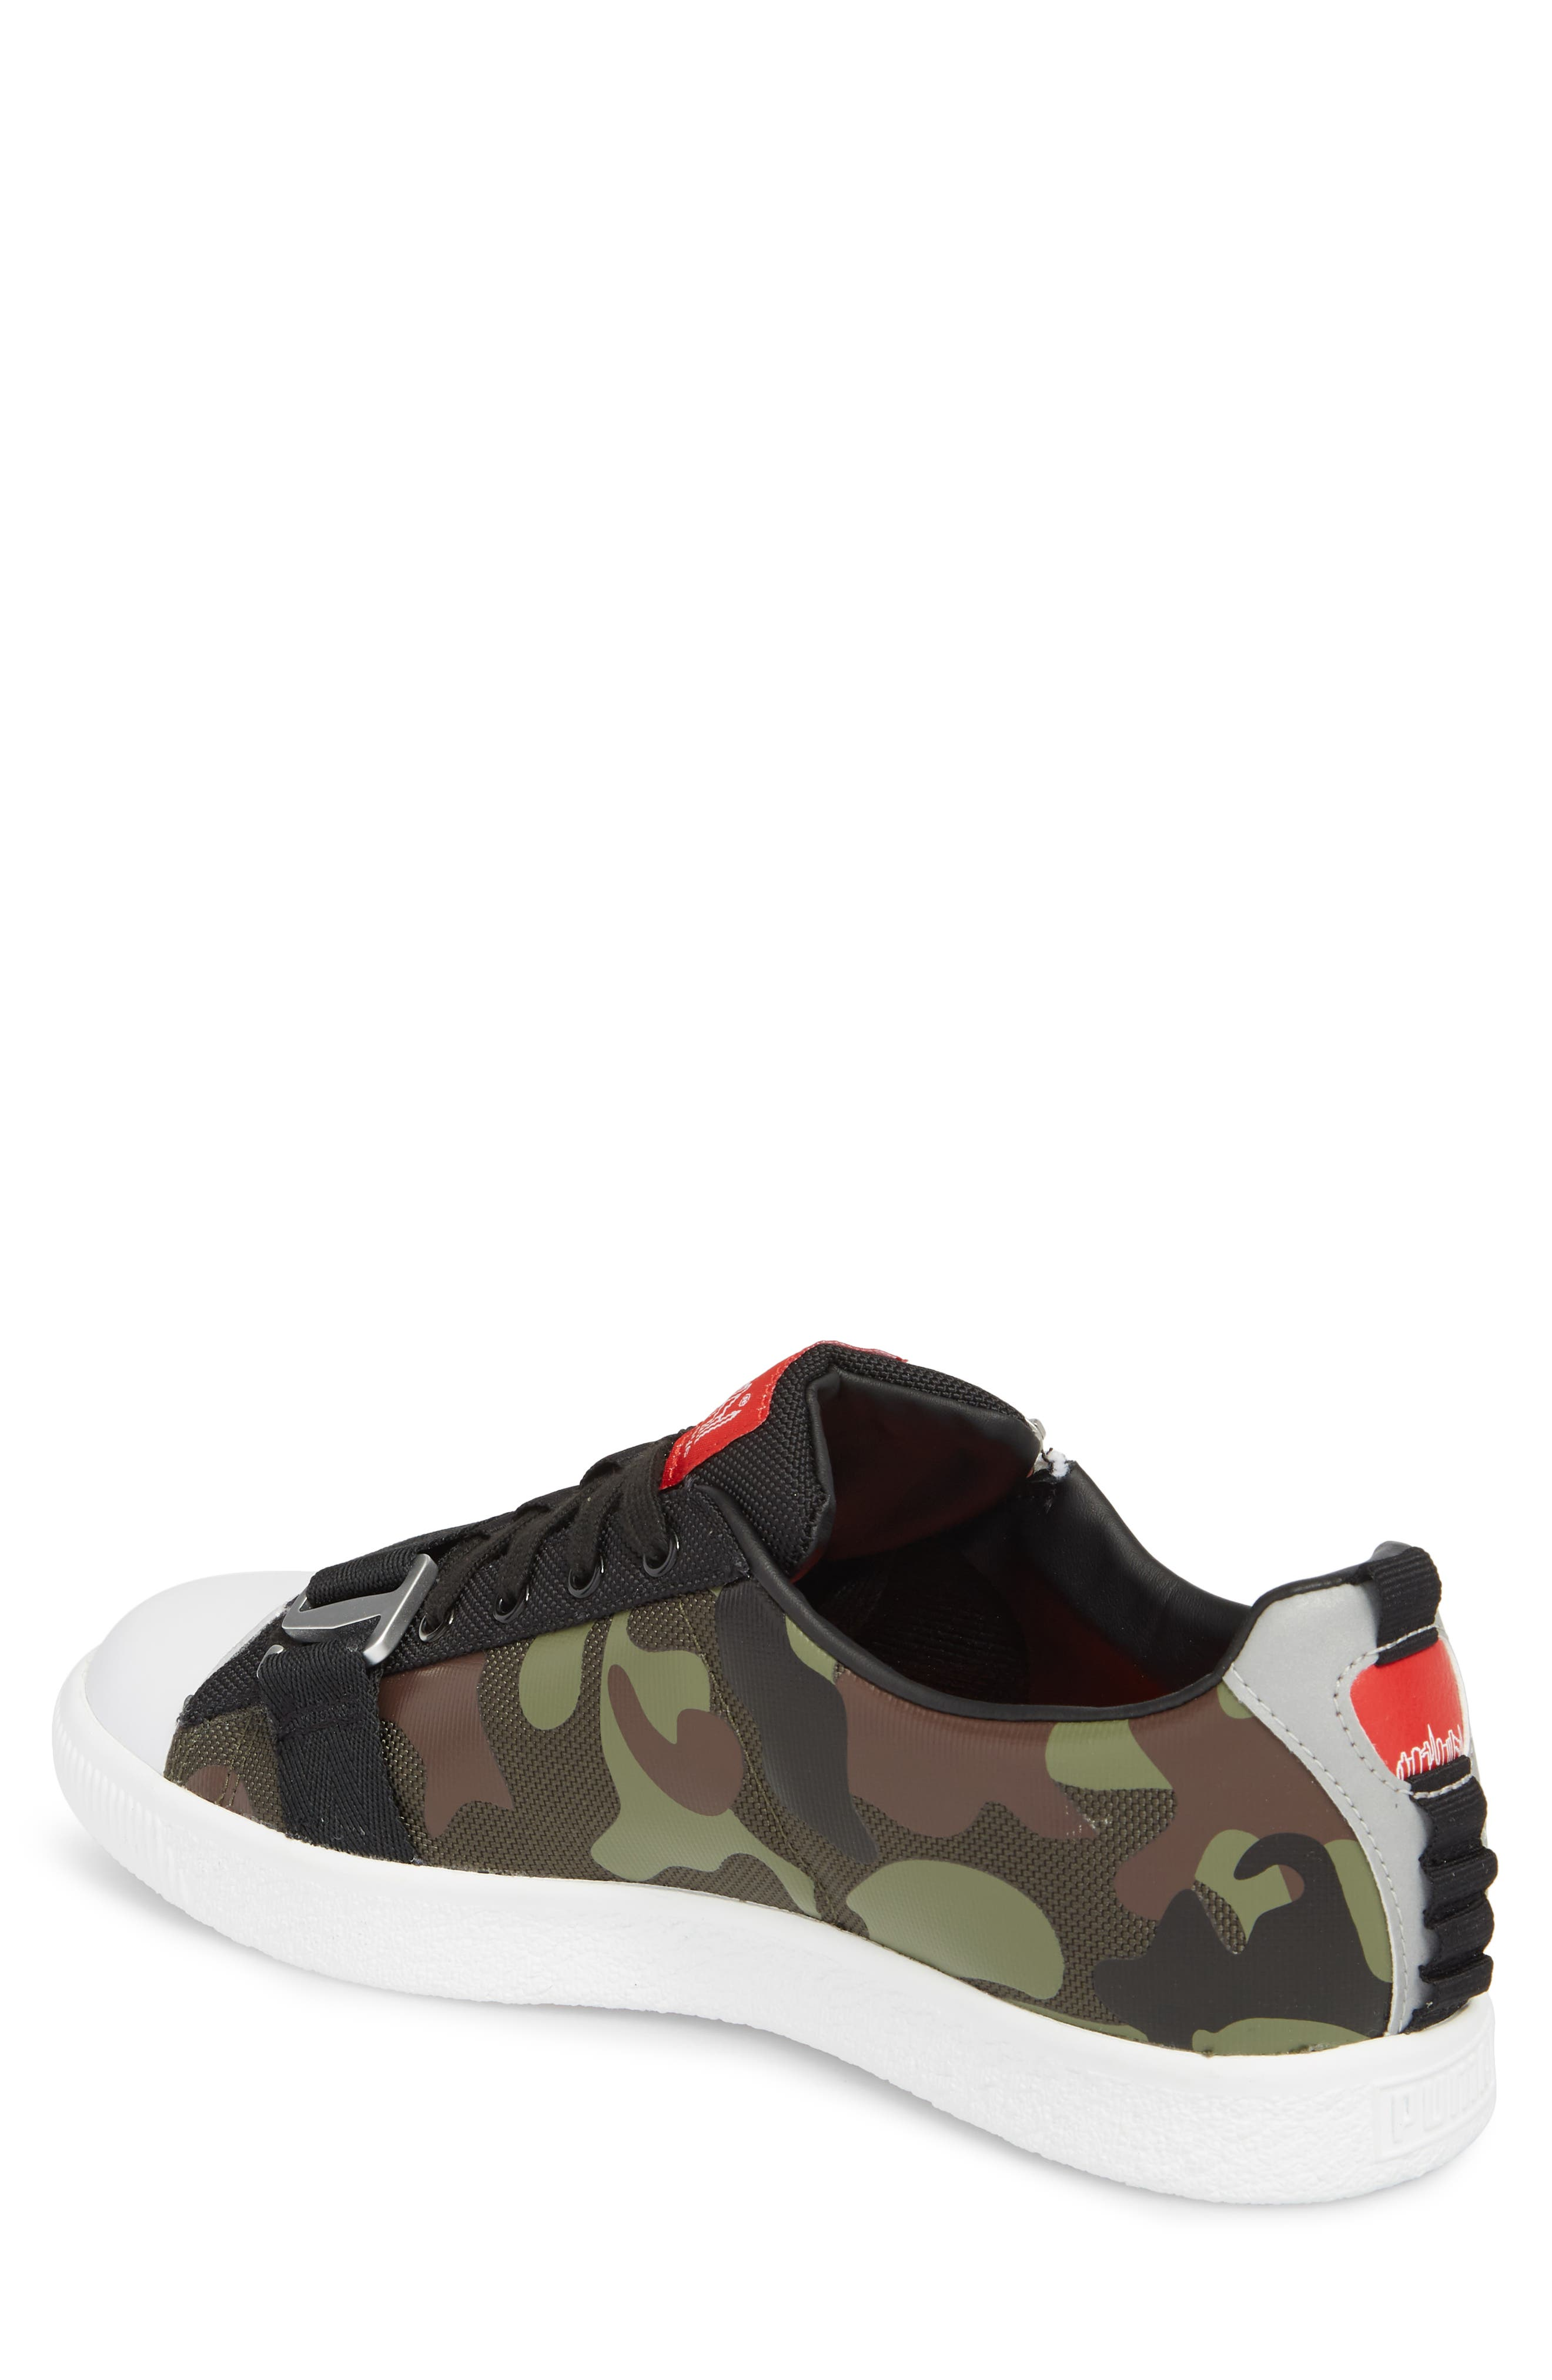 x MANHATTAN PORTAGE Clyde Zip Sneaker,                             Alternate thumbnail 2, color,                             300